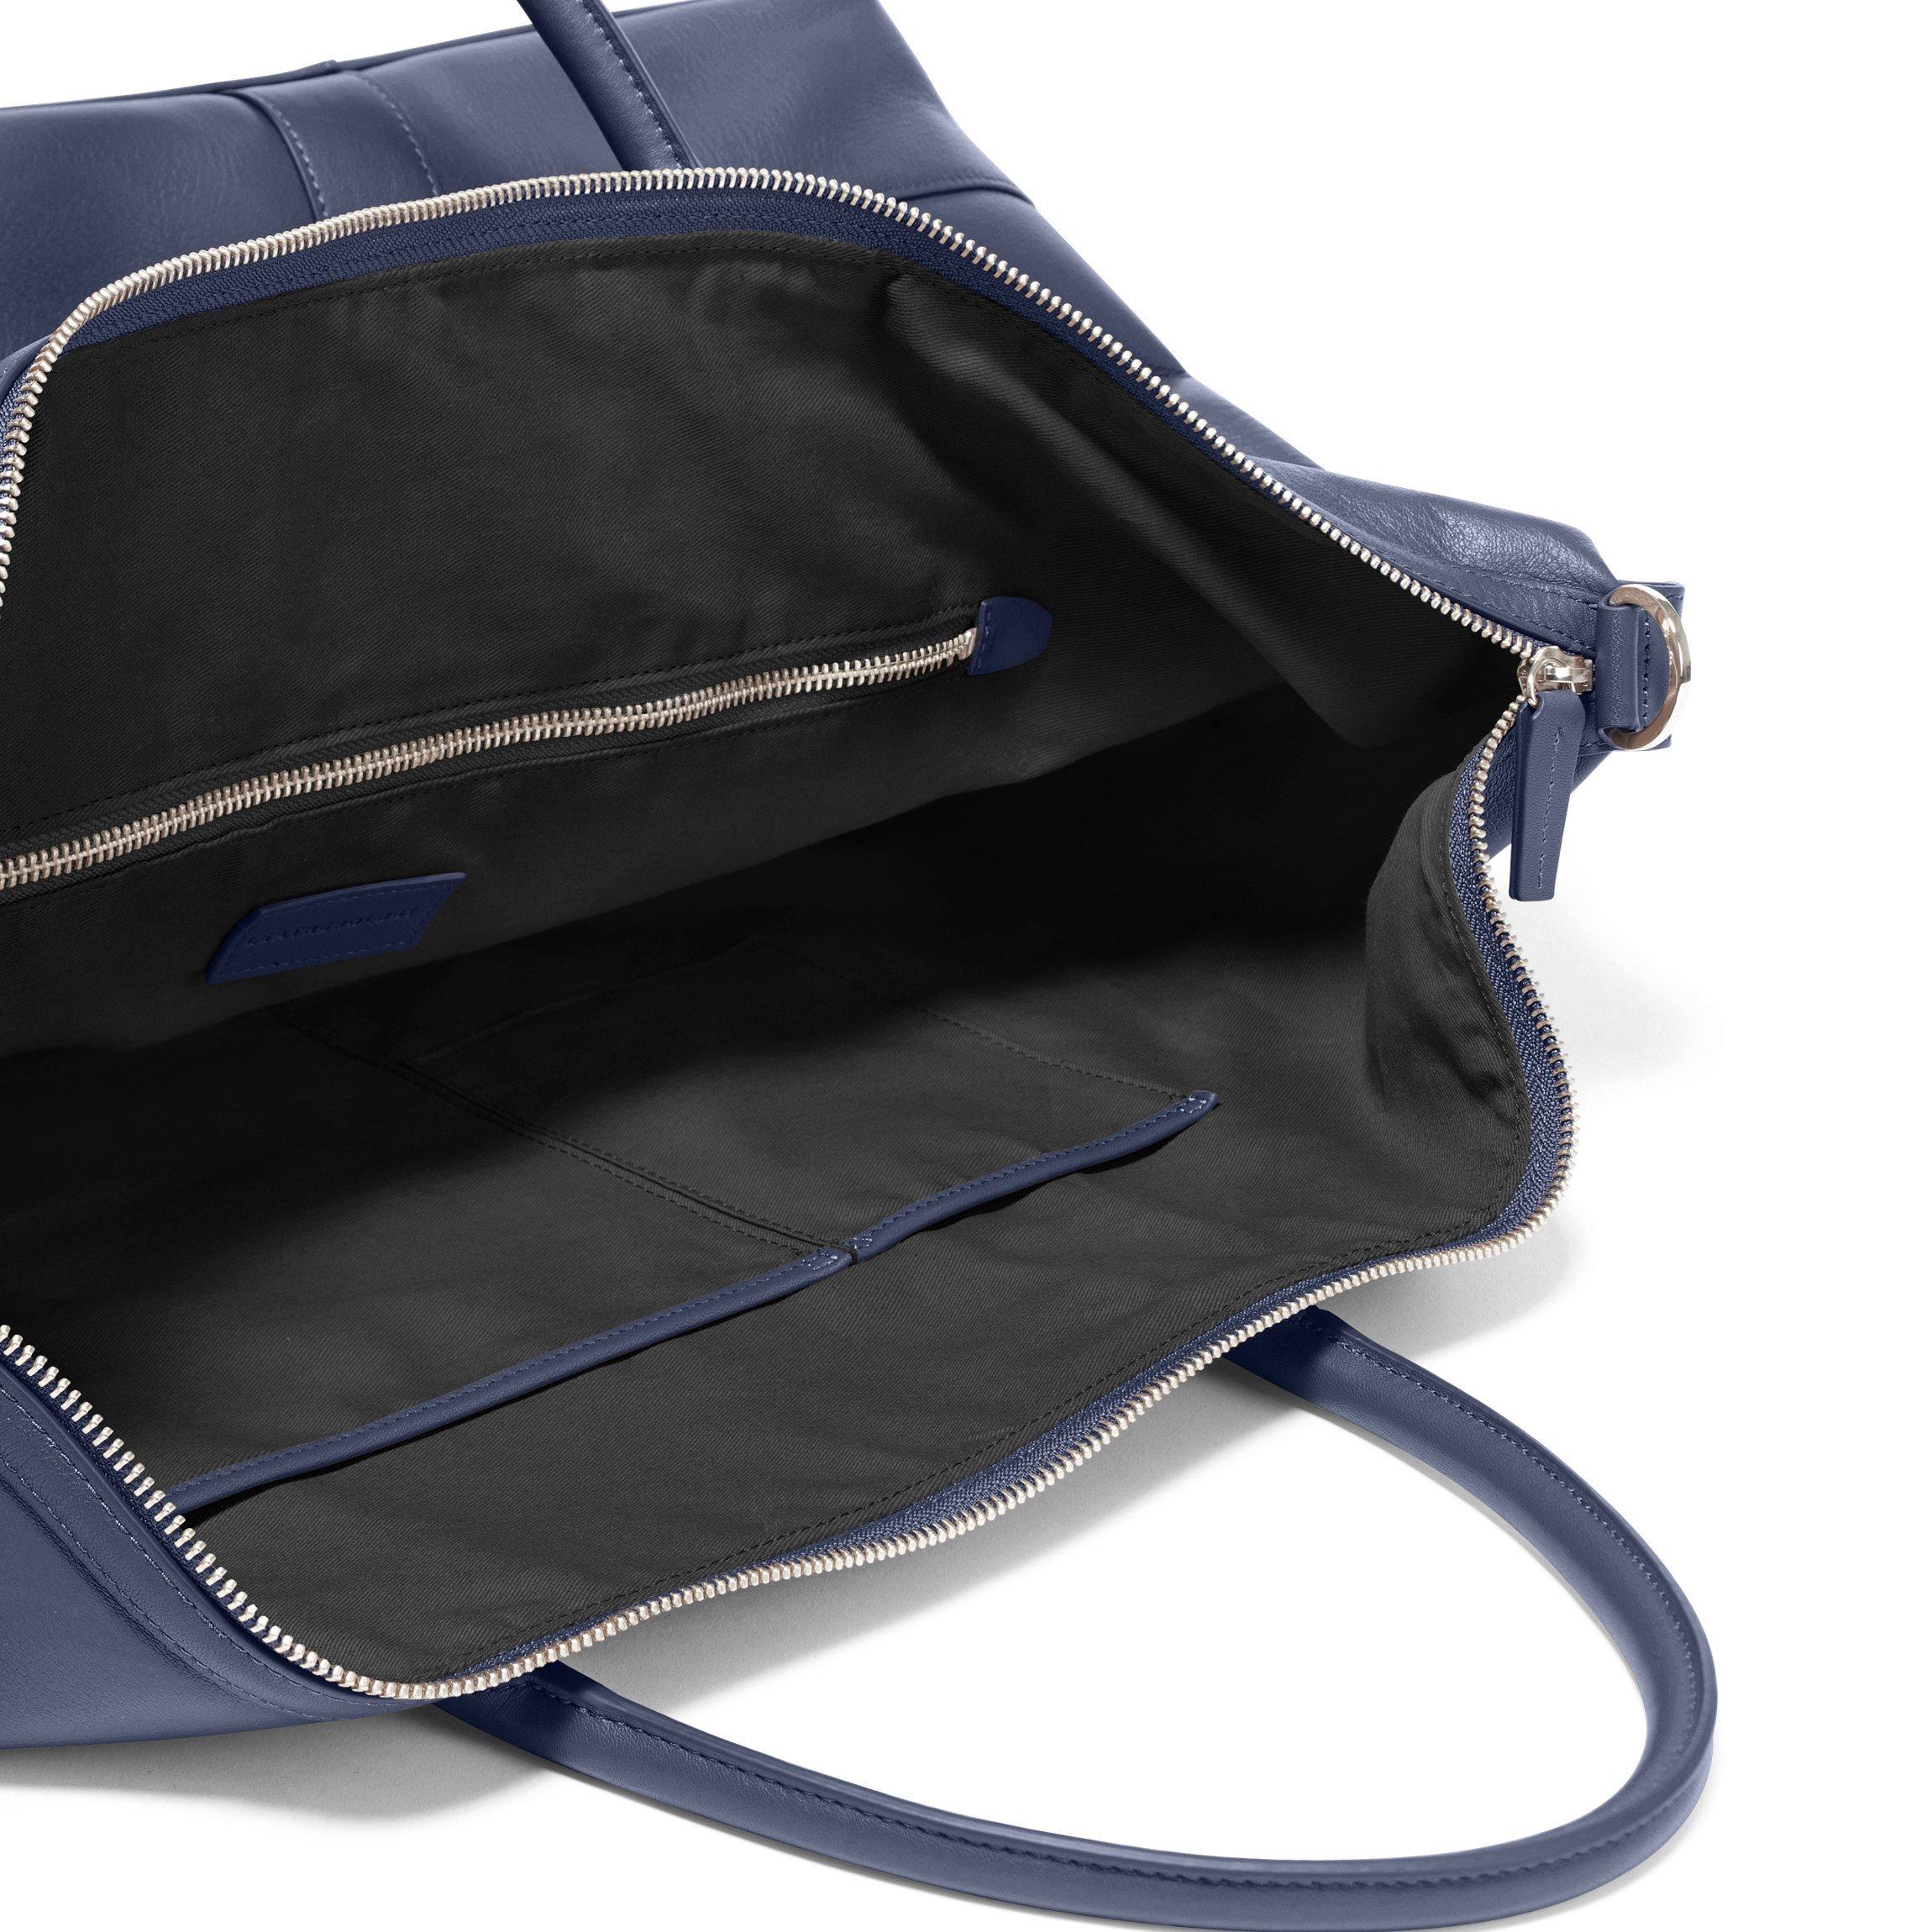 Kessler Medium Duffle - Full Grain Leather Leather - Navy (blue) by Leatherology (Image #2)